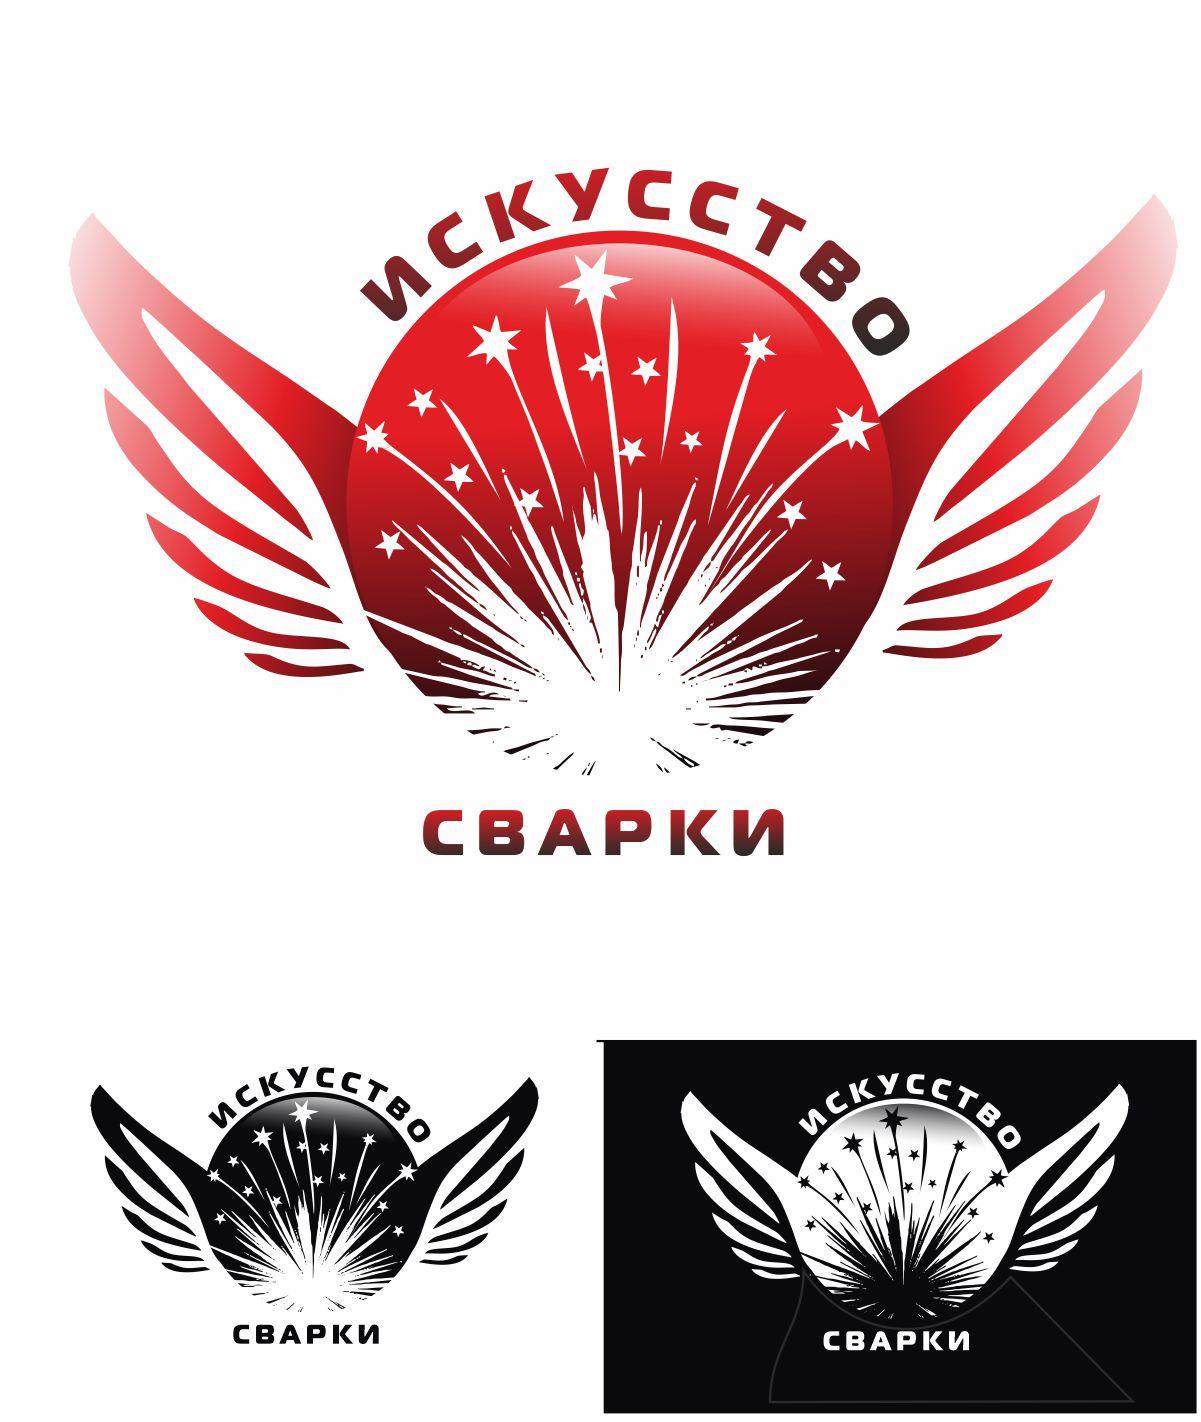 Разработка логотипа для Конкурса фото f_2945f6d83646720f.jpg